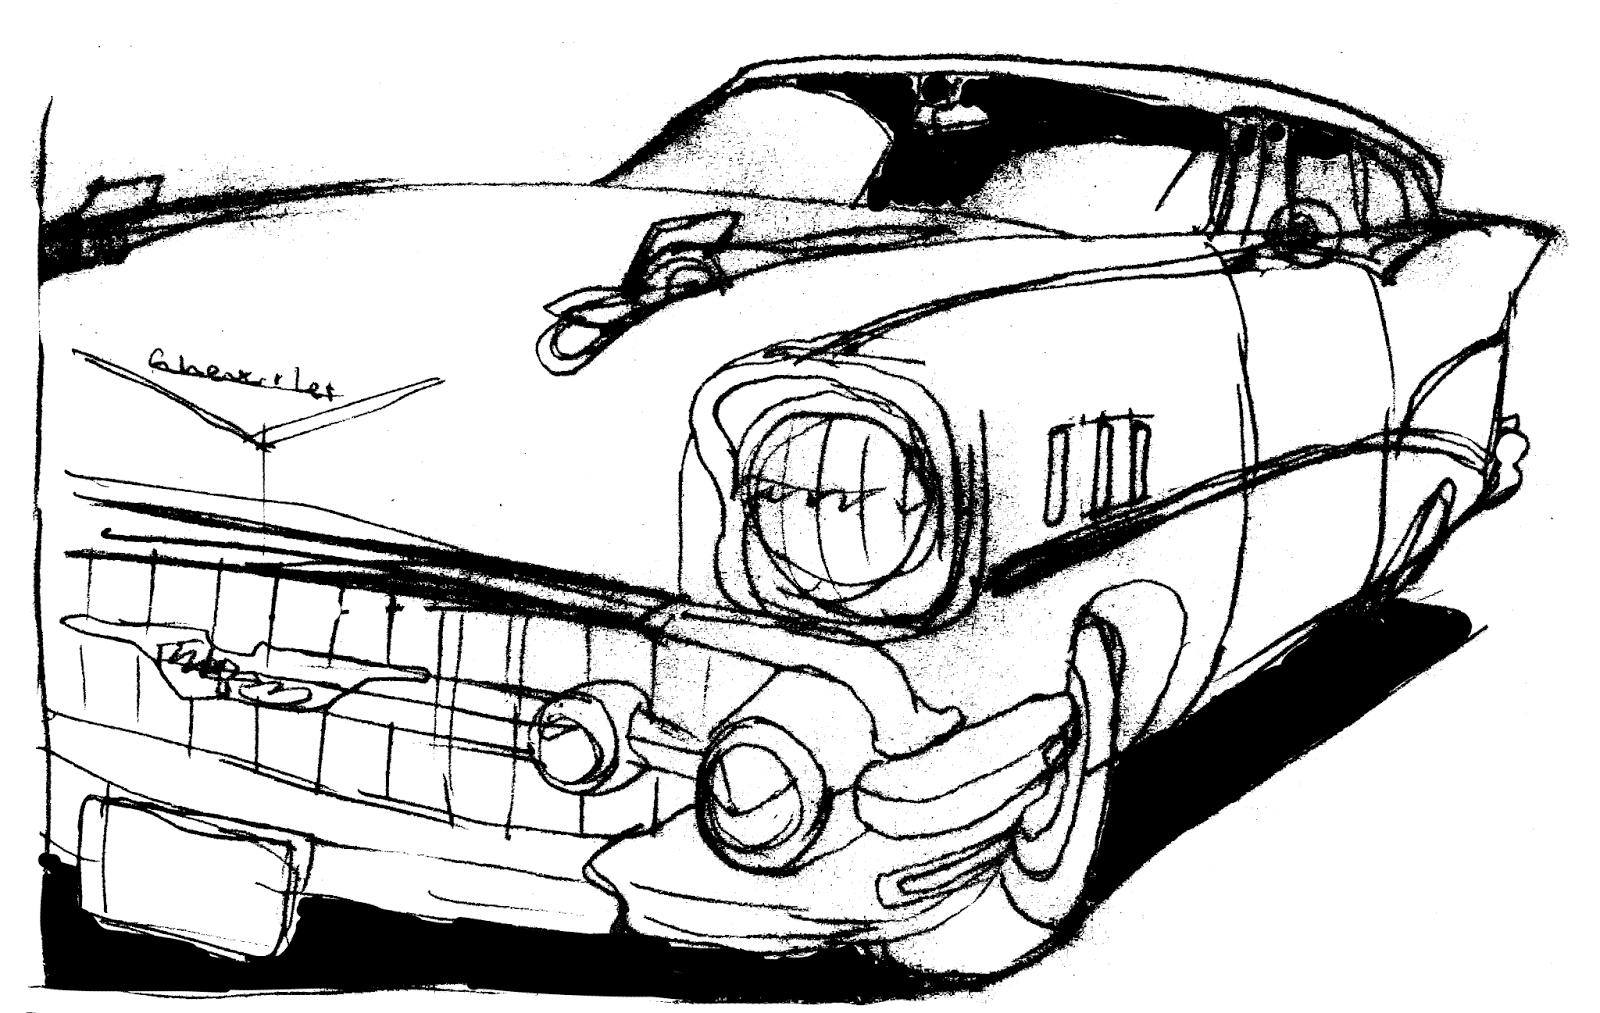 1600x1013 Don Moyer Sketchbook 57 Chevy